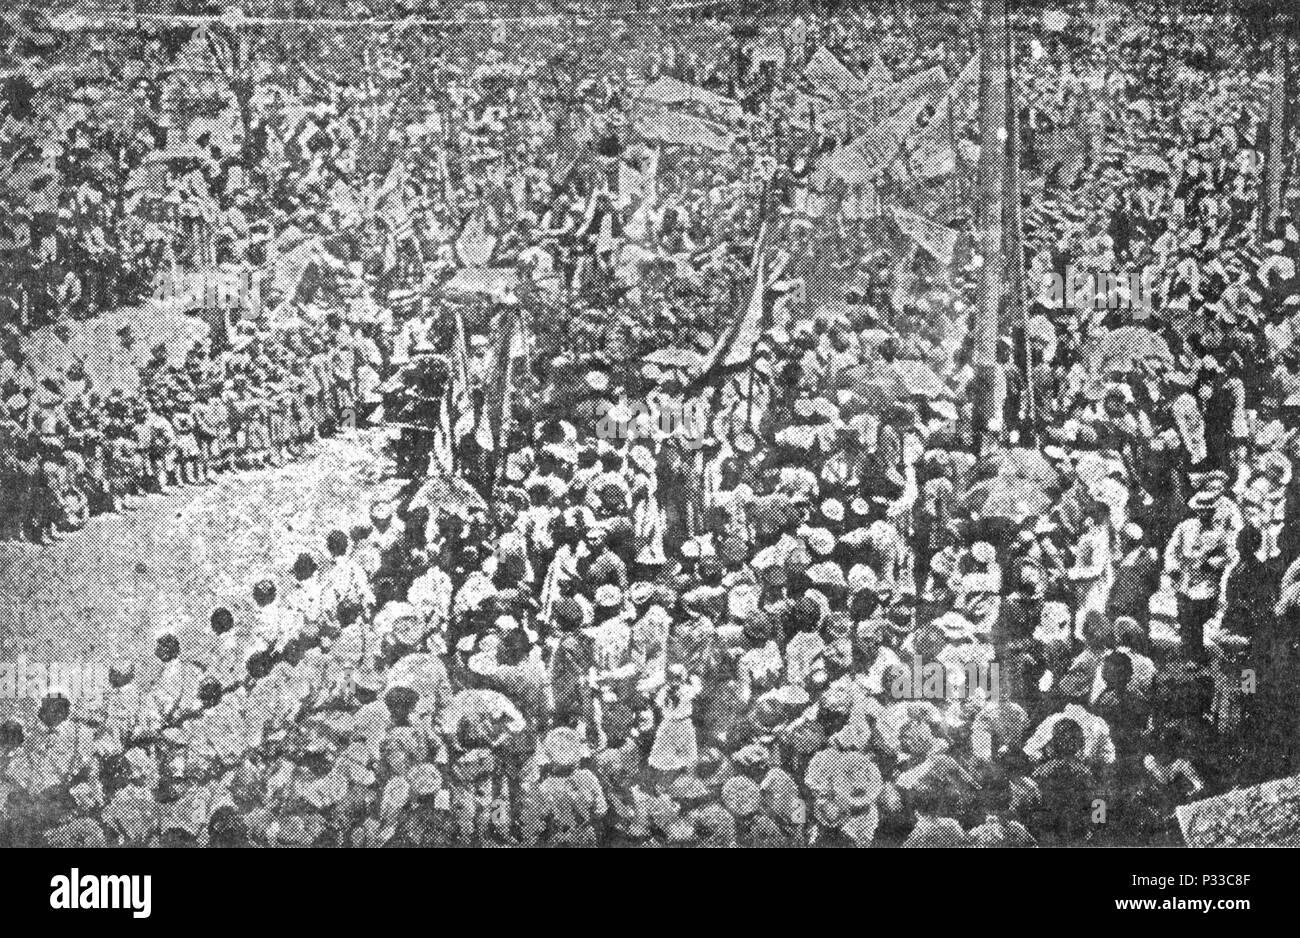 062 may 28 1919 Armenia celebration - Stock Image